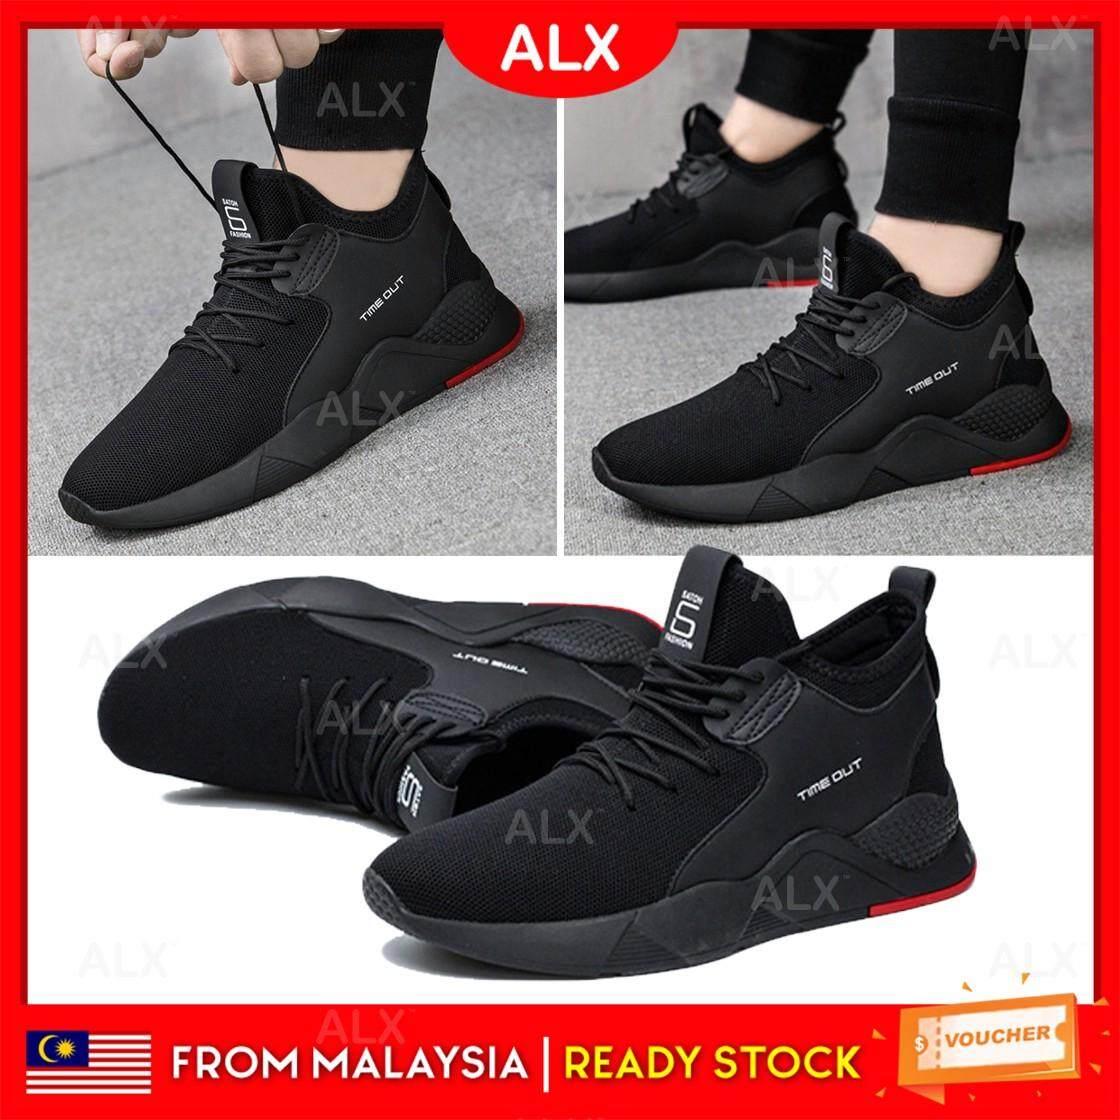 ALX Malaysia Comfortable Elegant Men